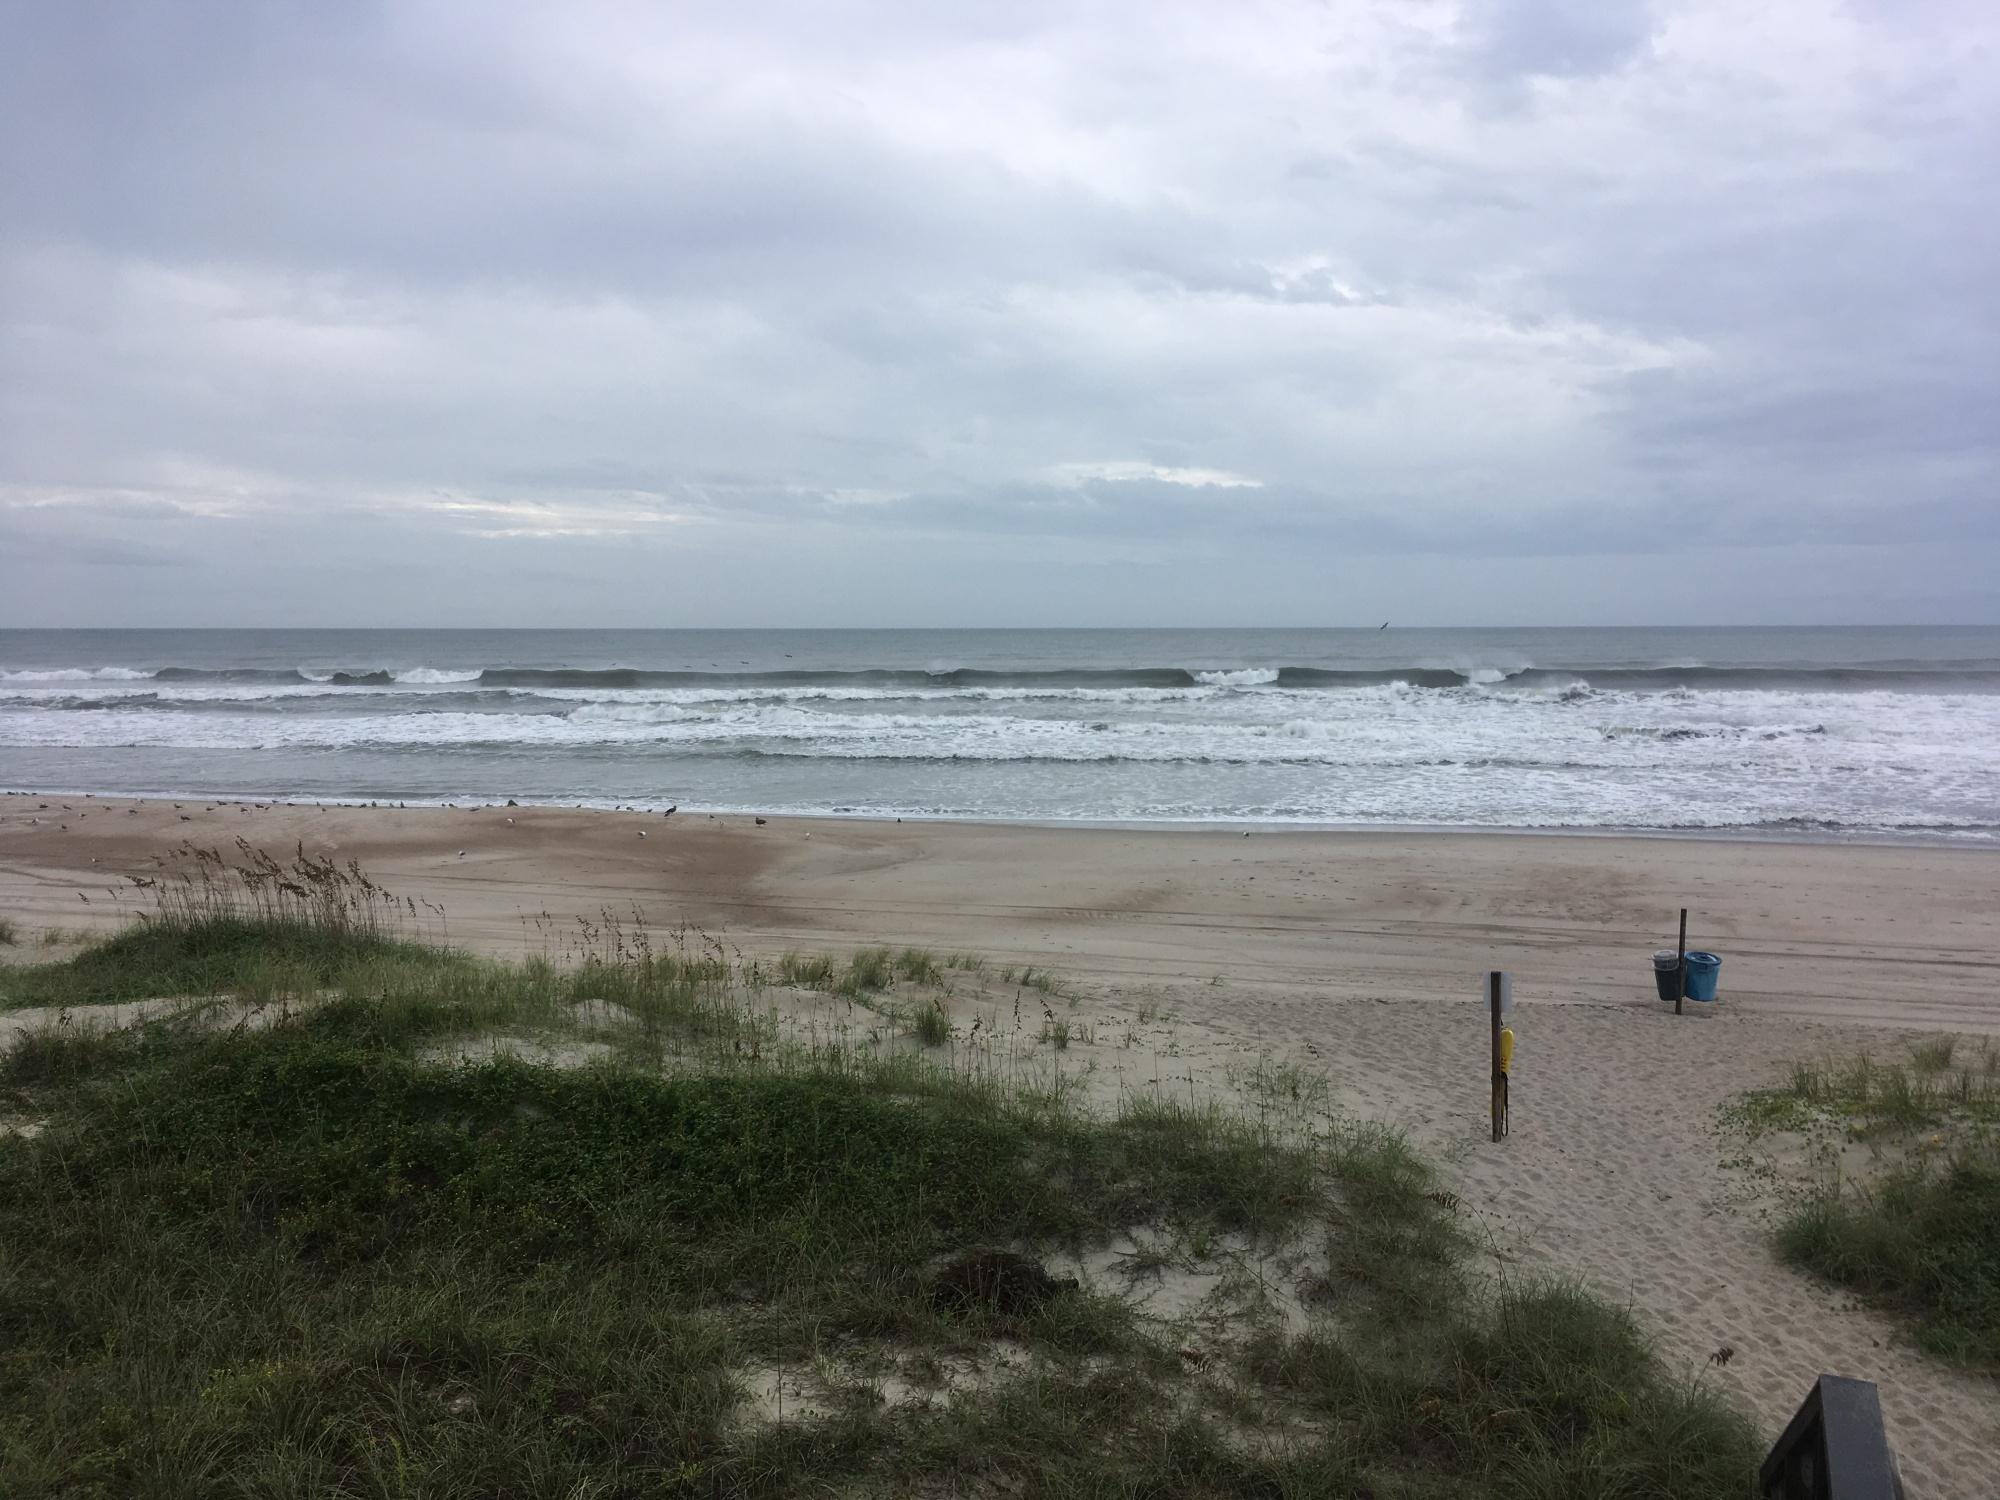 eisurflessons – ei surf lessons – emerald isle n c